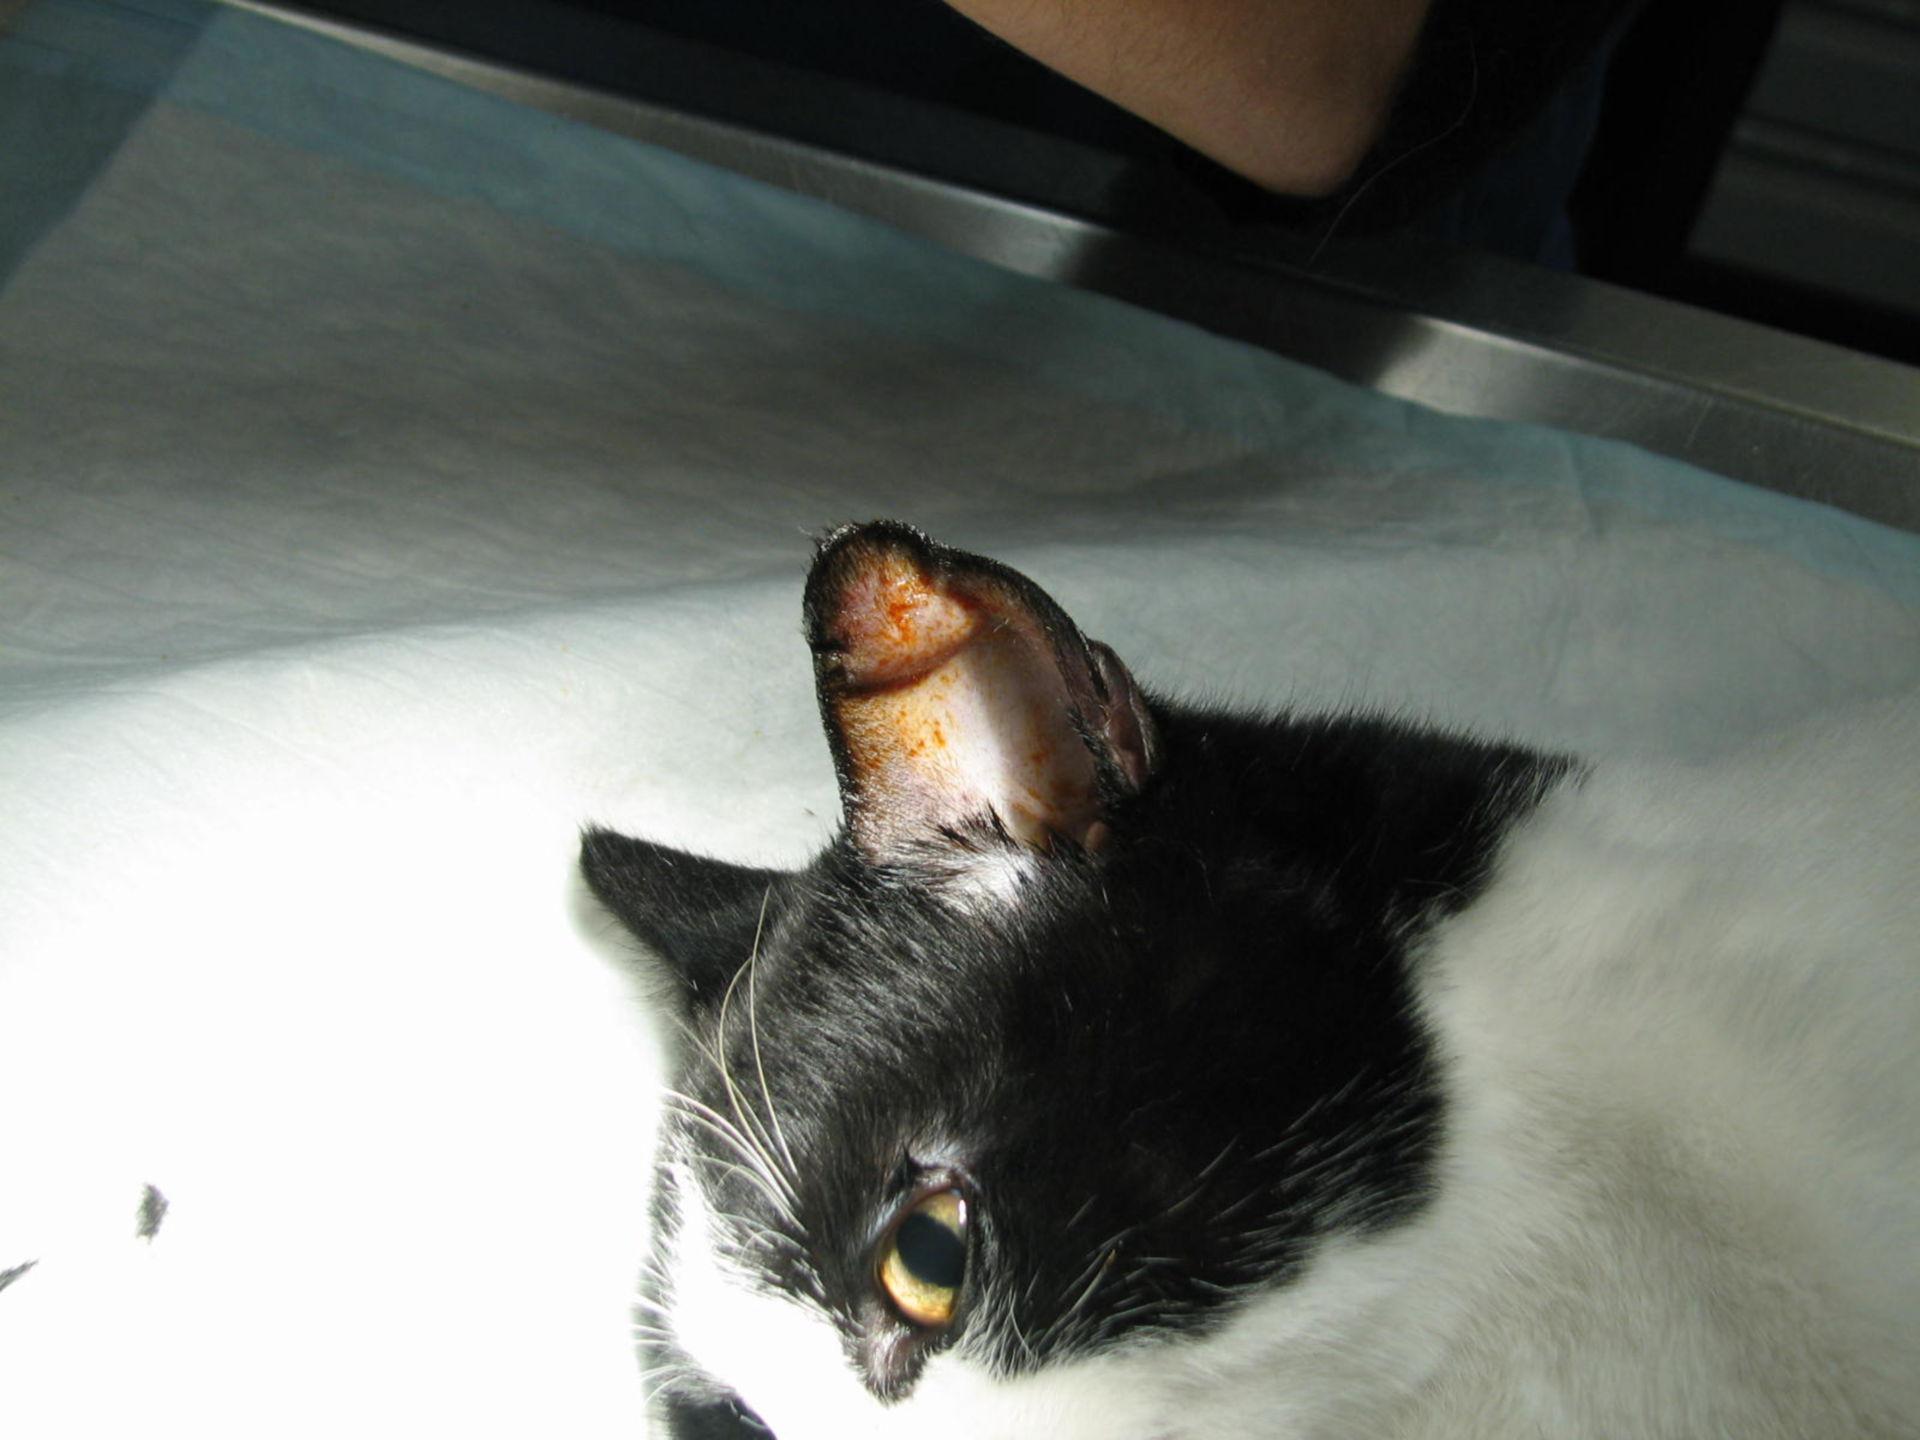 Othaematoma cat